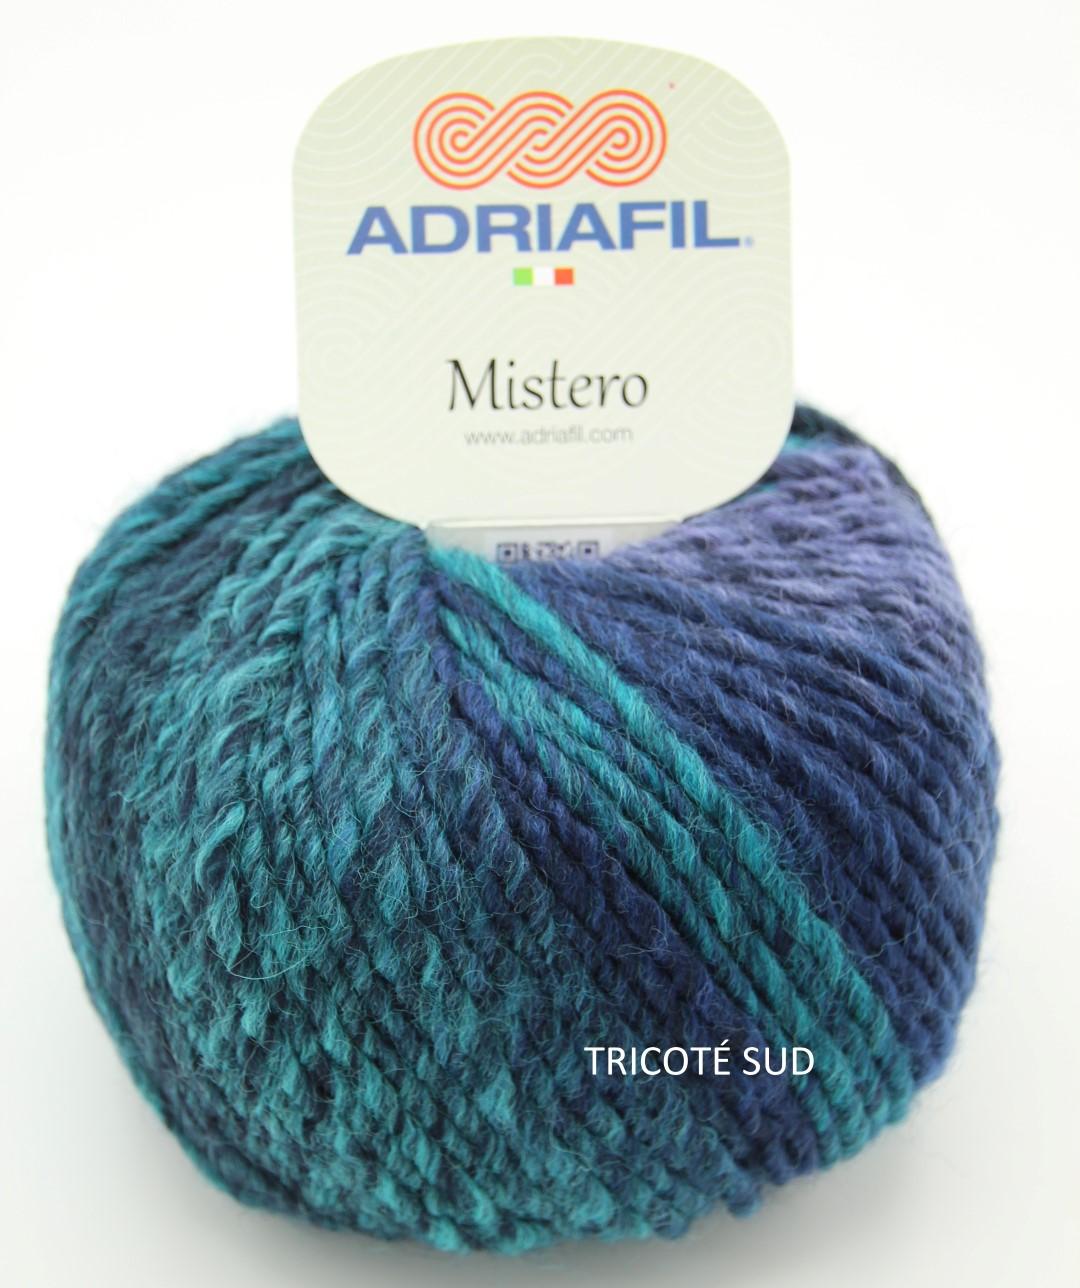 MISTERO ADRIAFIL COLORIS 67 (1) (Large)